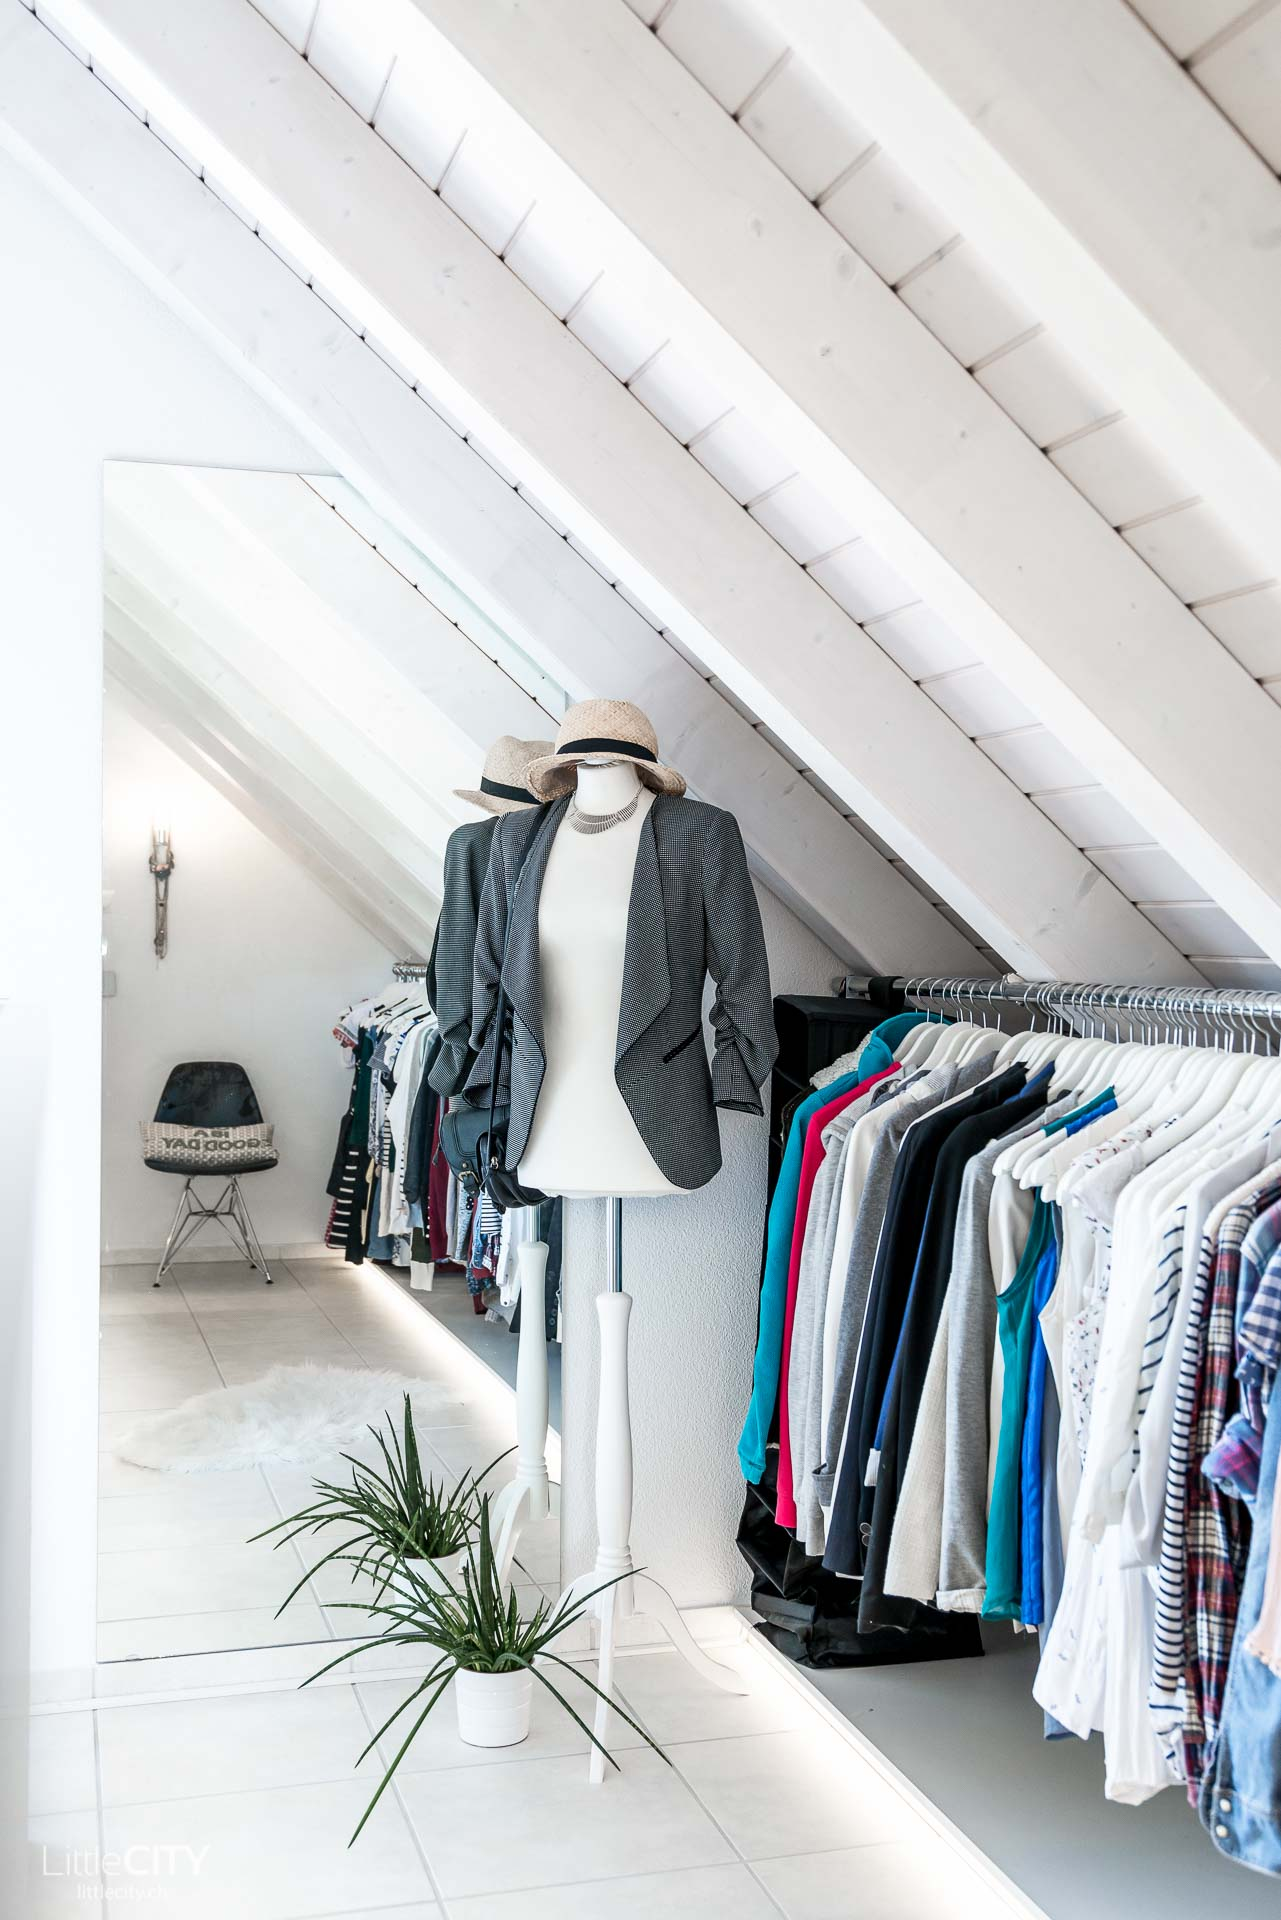 Begehbarer Kleiderschrank Diy 11 Reiseblog Food Lifestyle Blog